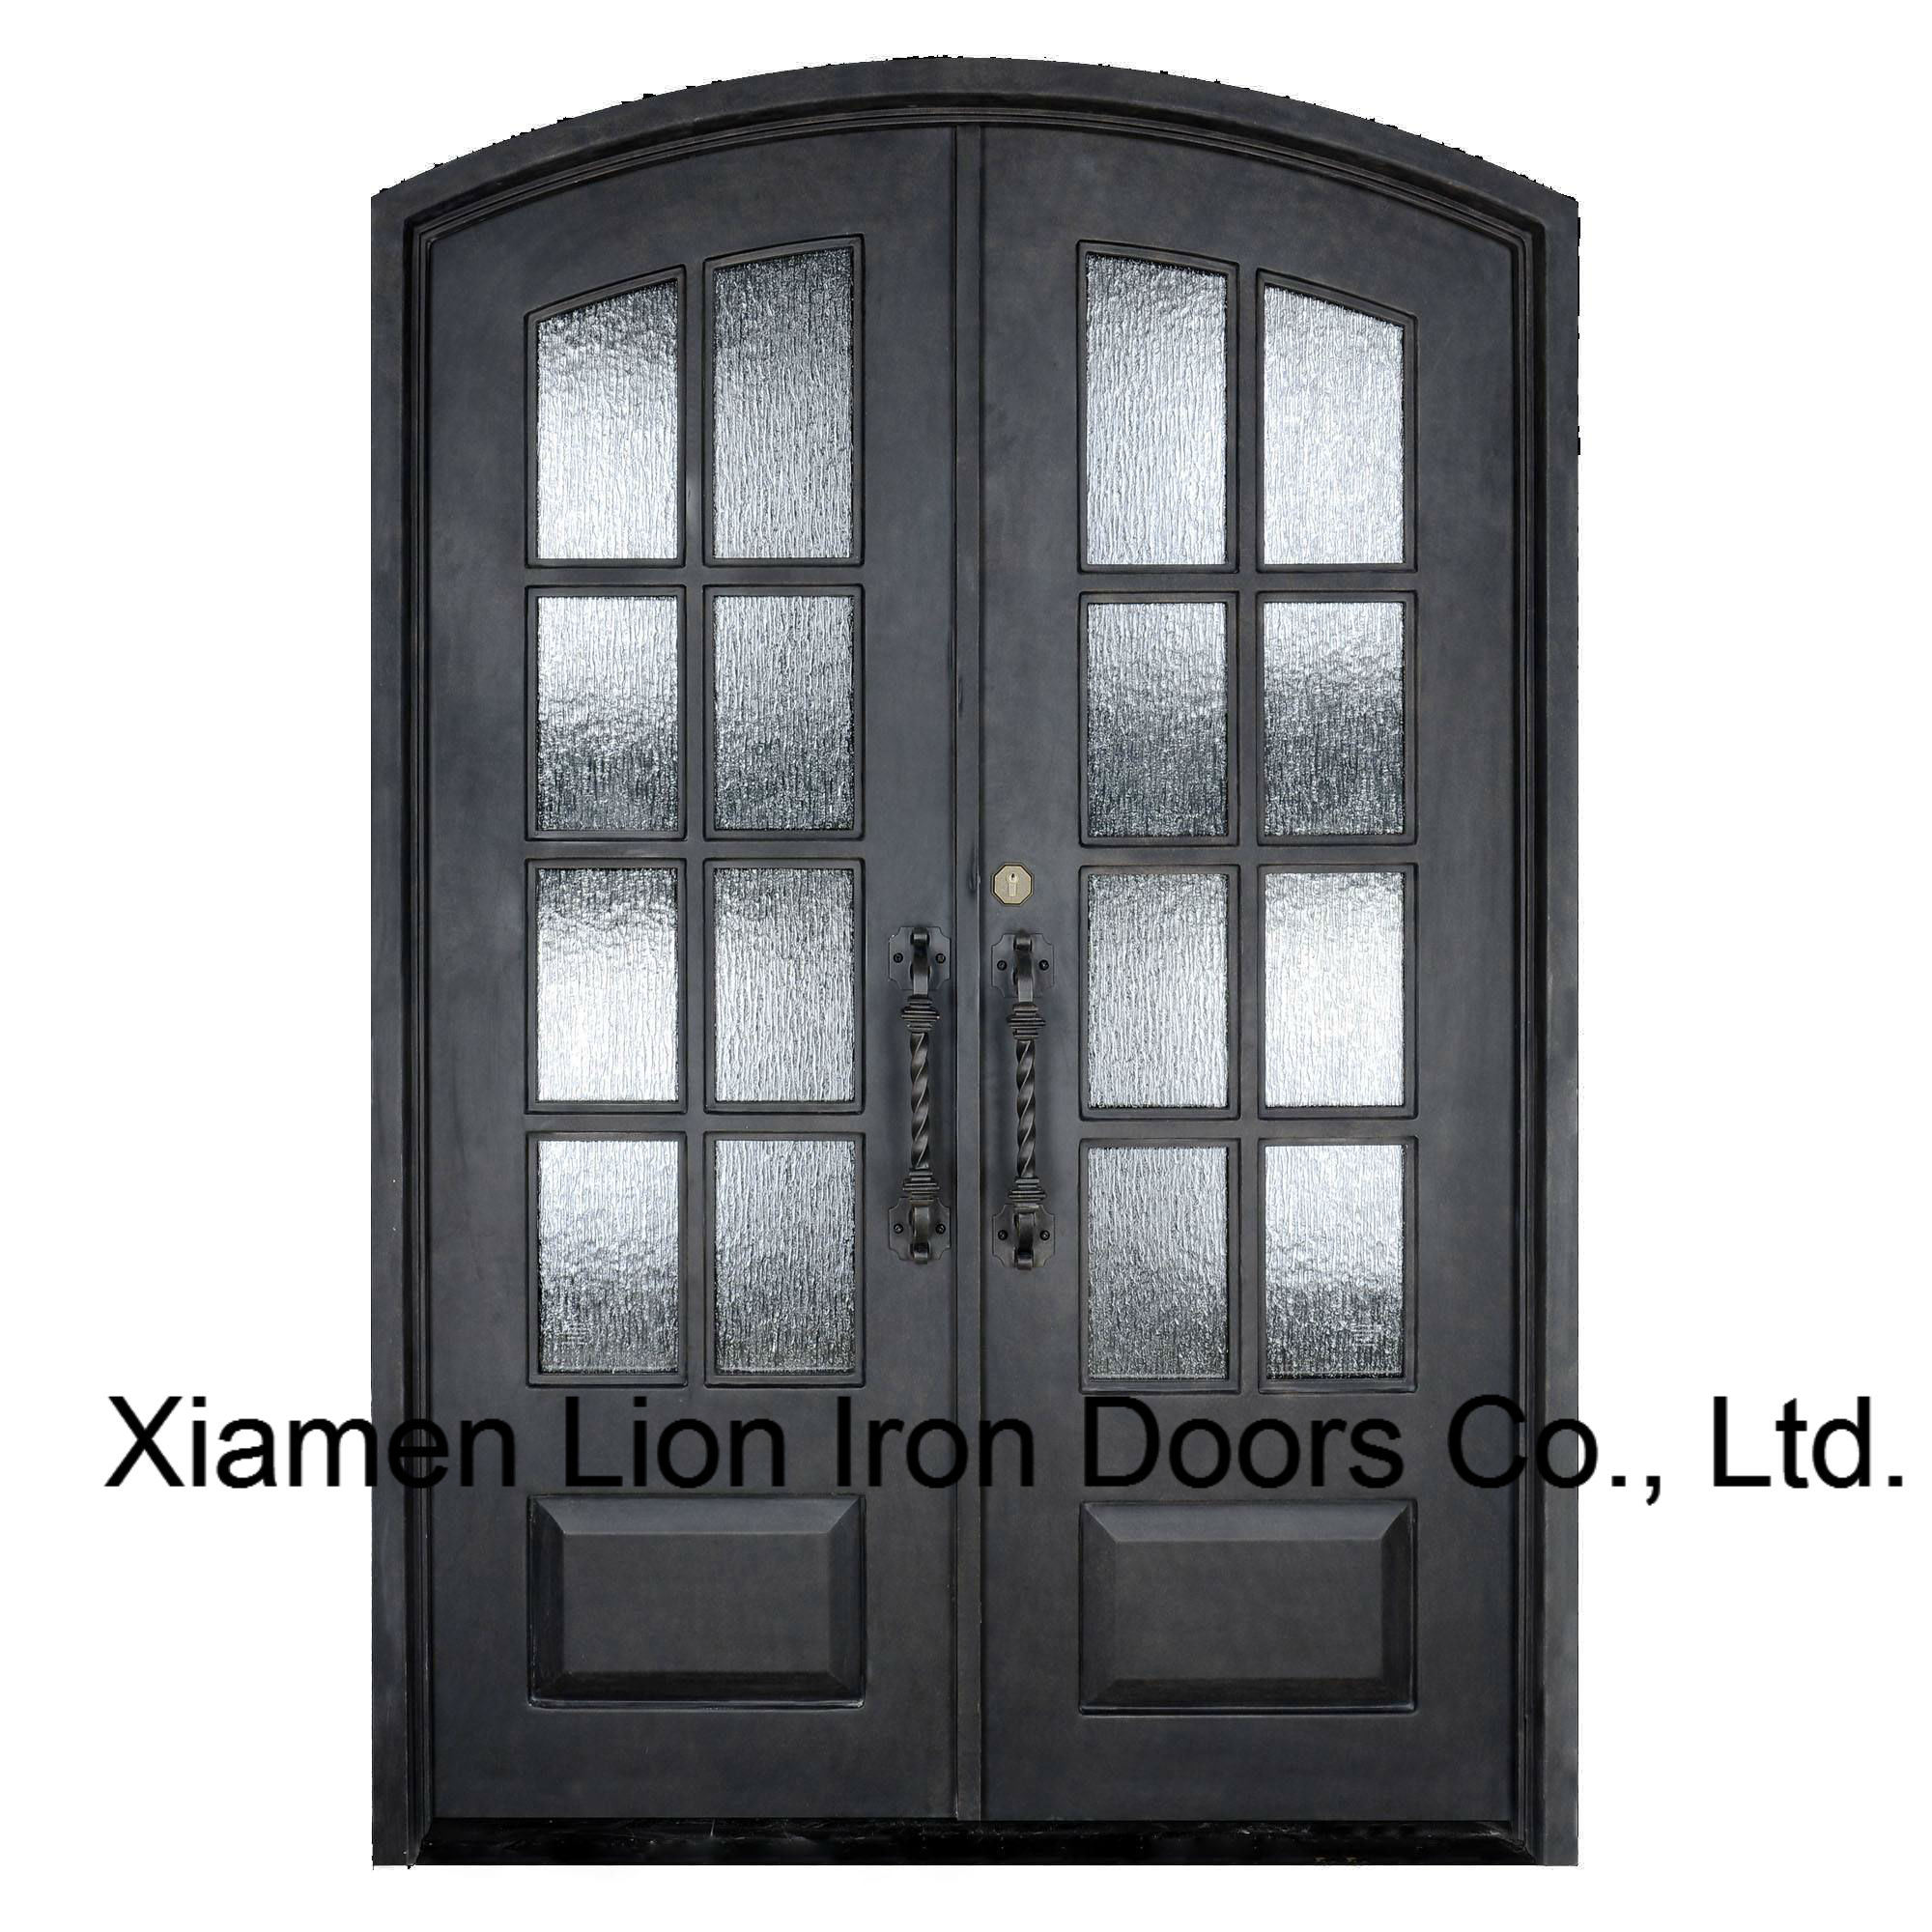 Strong Durability Iron Entry Door with Tempered Rain Glass Design  sc 1 st  Xiamen Lion Iron Doors Co. Ltd. & China Strong Durability Iron Entry Door with Tempered Rain Glass ...